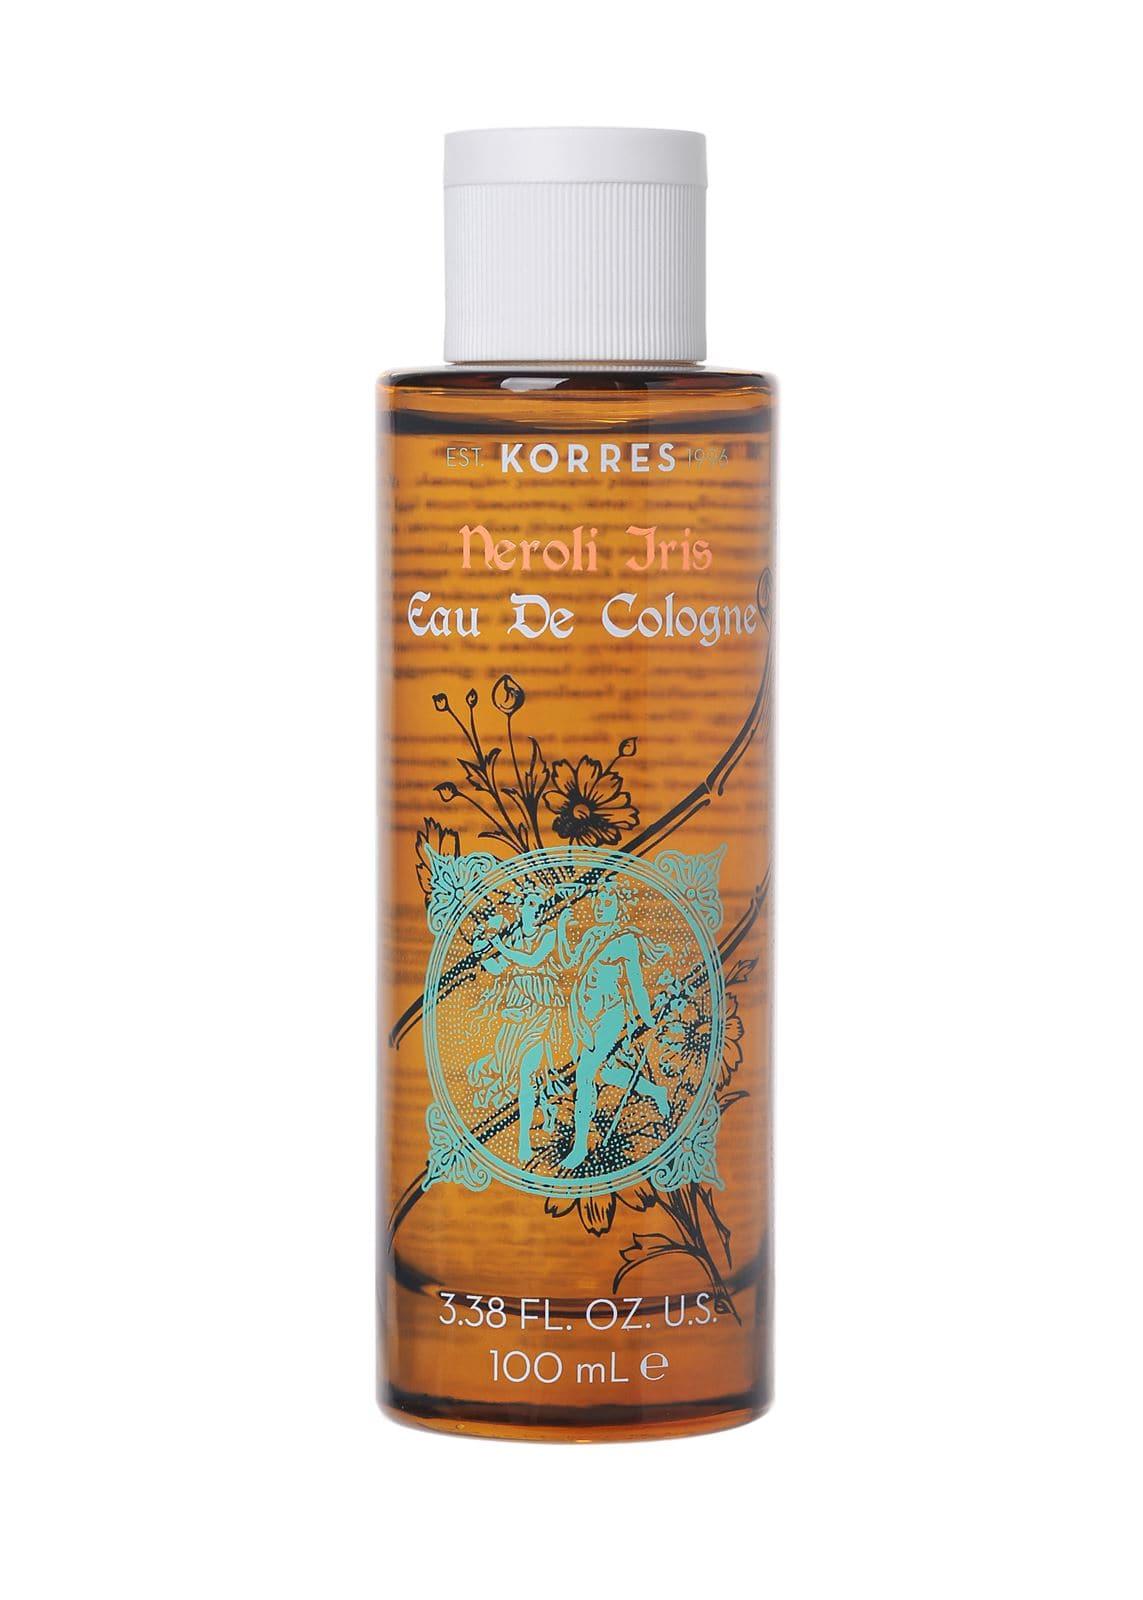 Korres Neroli Iris Eau De Cologne Κολόνια Νέρολι & Άρωμα Πούδρας από Μπουκέτα Ίριδας, 100ml